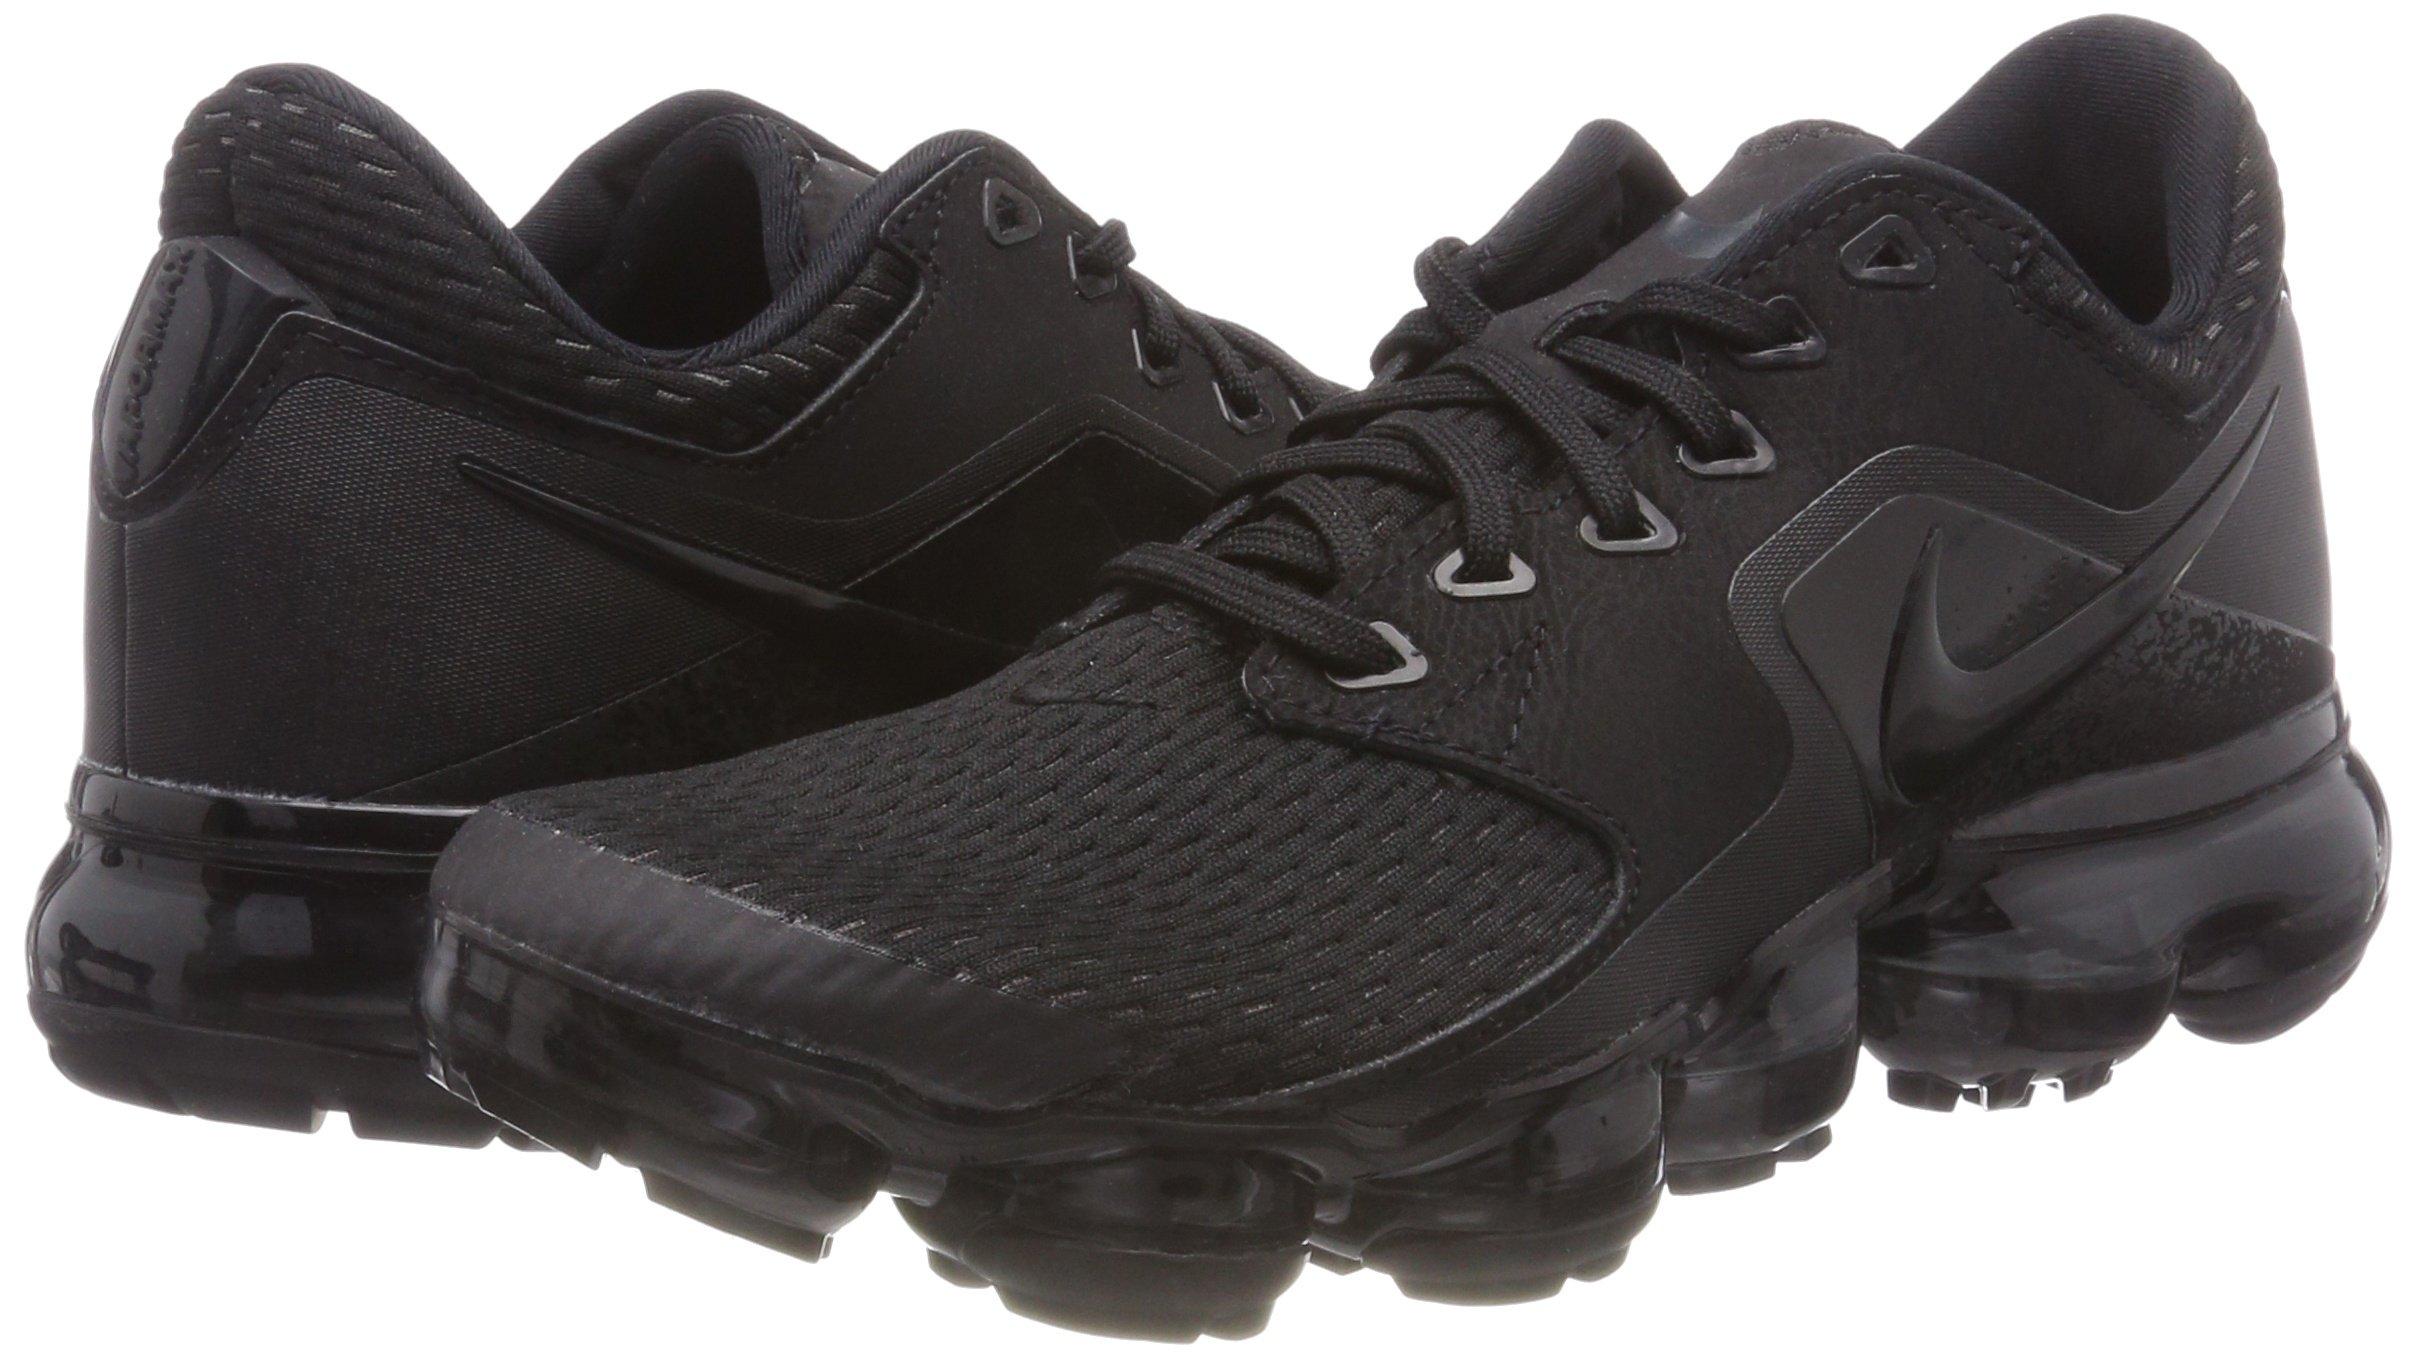 NIKE Kids' Grade School Air Vapormax Running Shoes (Black/Black/Black,5) by NIKE (Image #5)